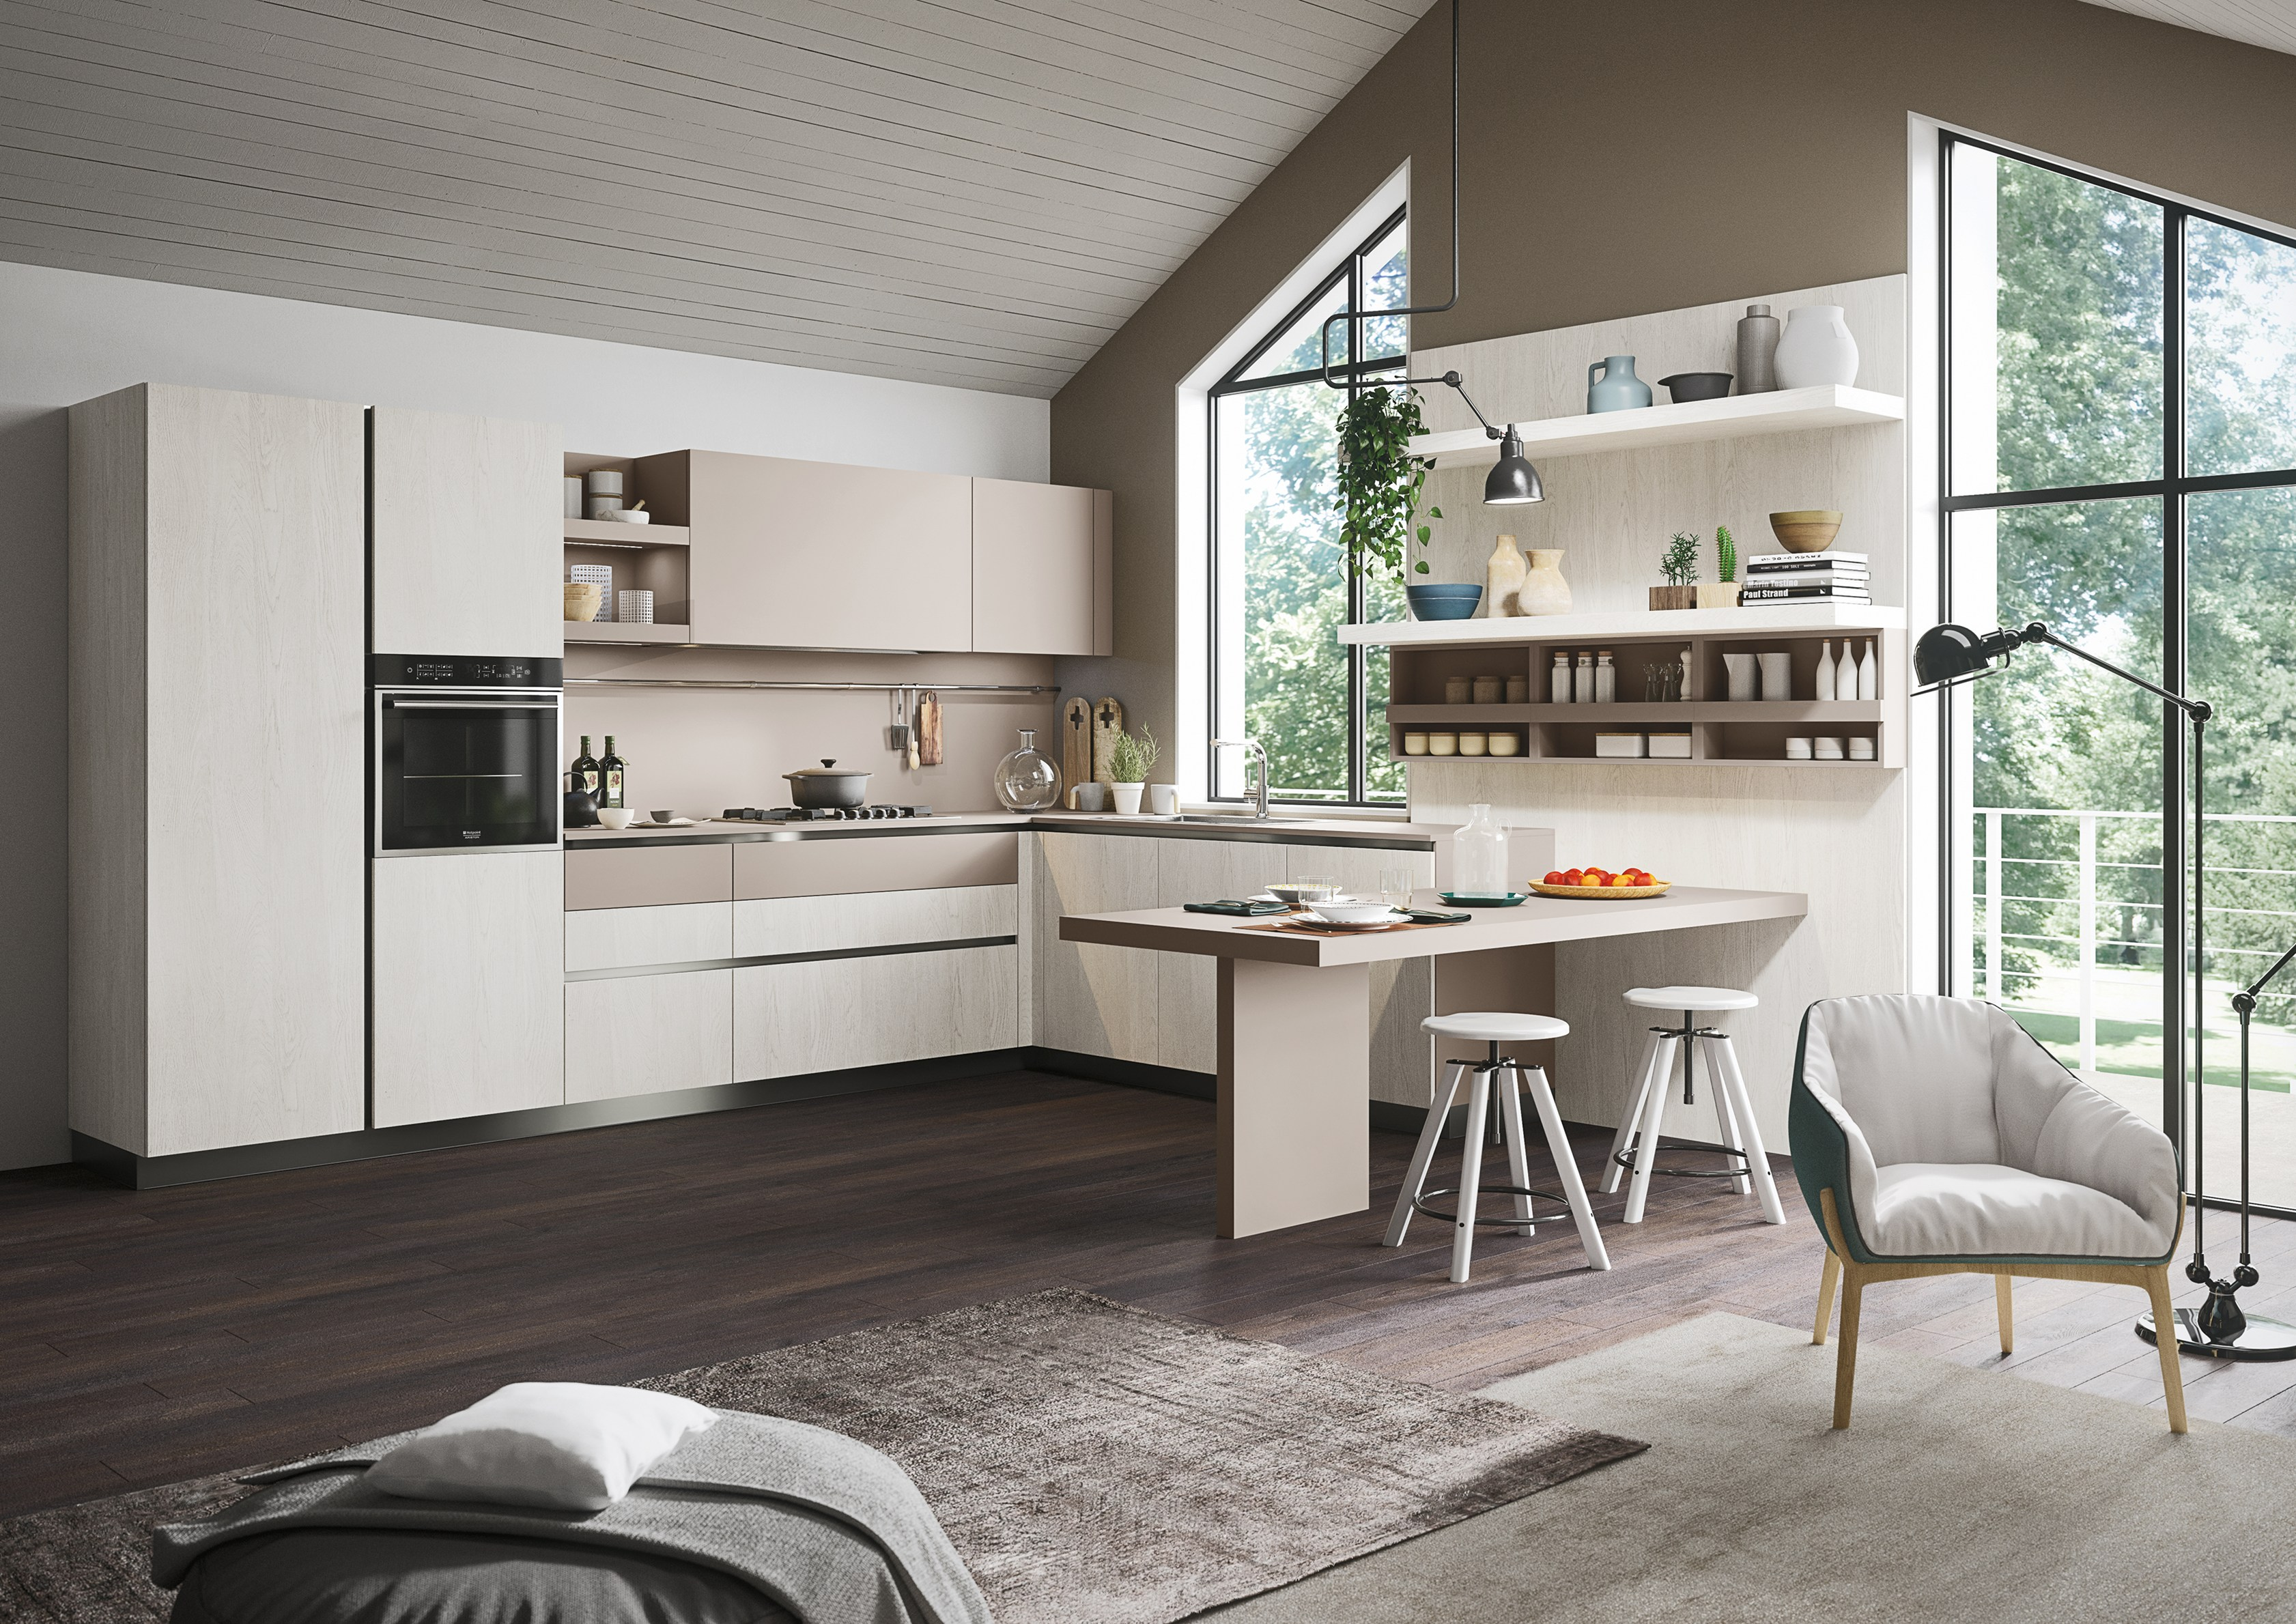 First cucina in stile moderno by snaidero design snaidero for Cucina in stile prateria